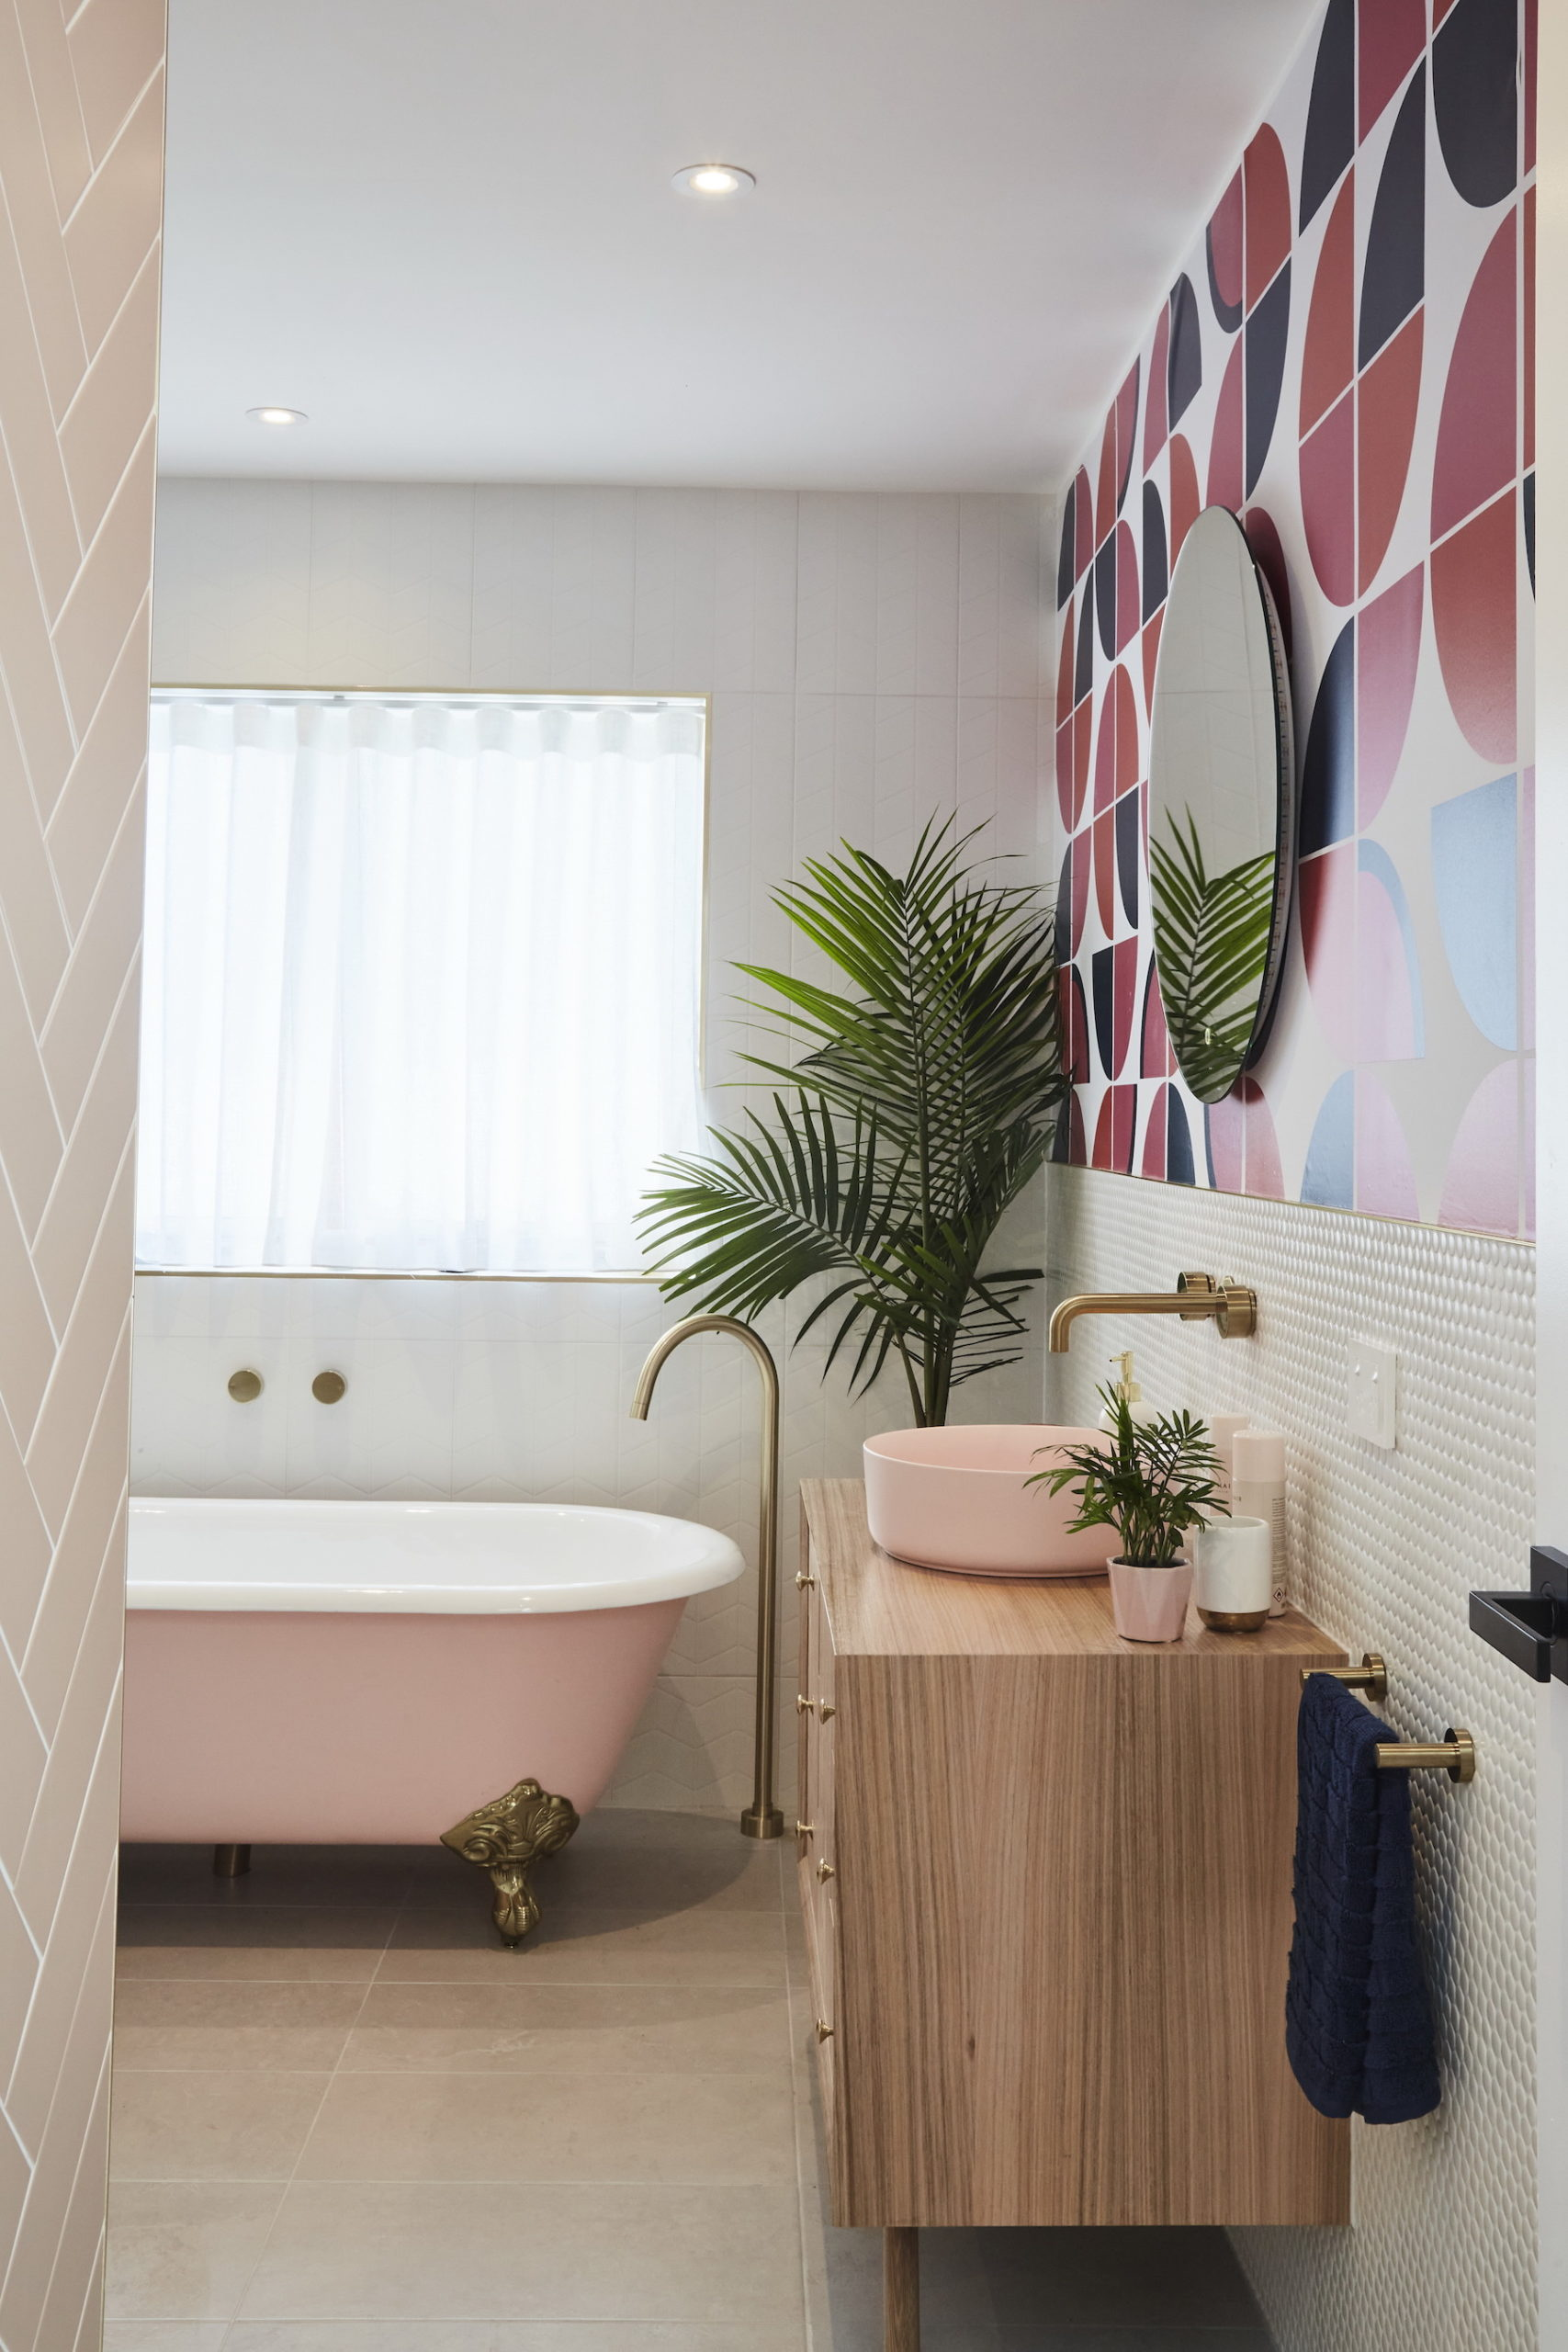 house rules 2020 kimmy and rhi bathroom with pink freestanding bath tub